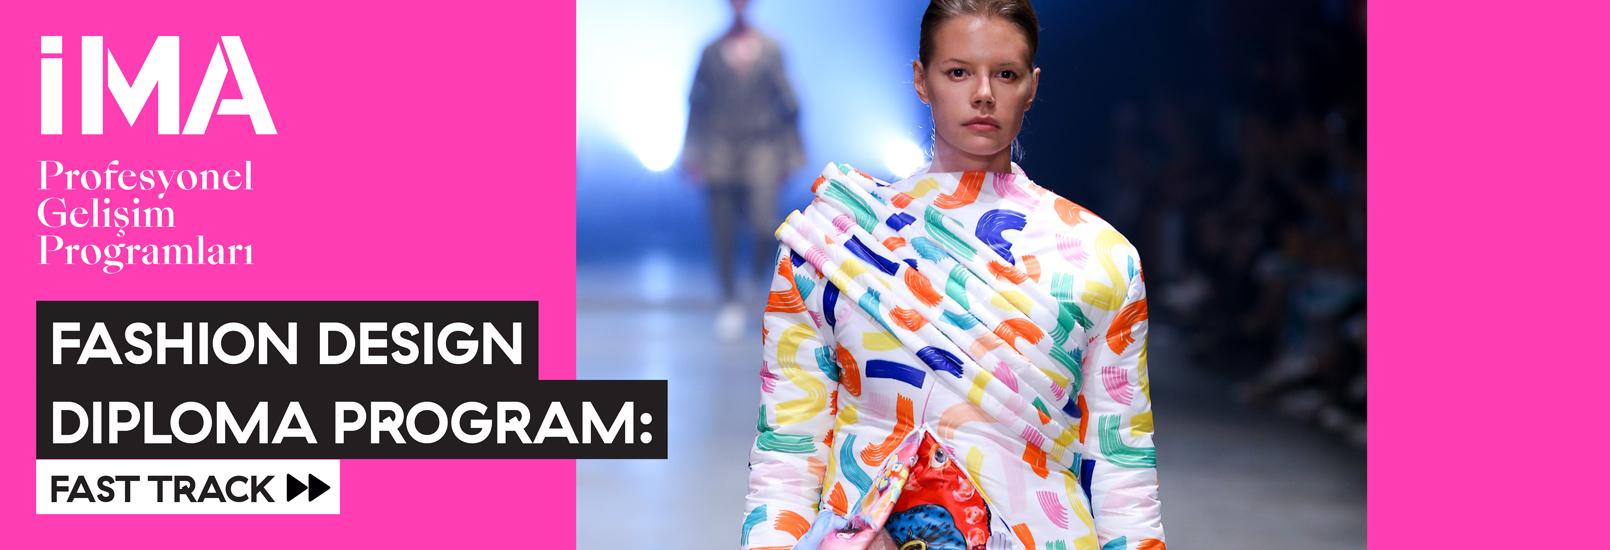 Fashion Design and Diploma Program Fast Track